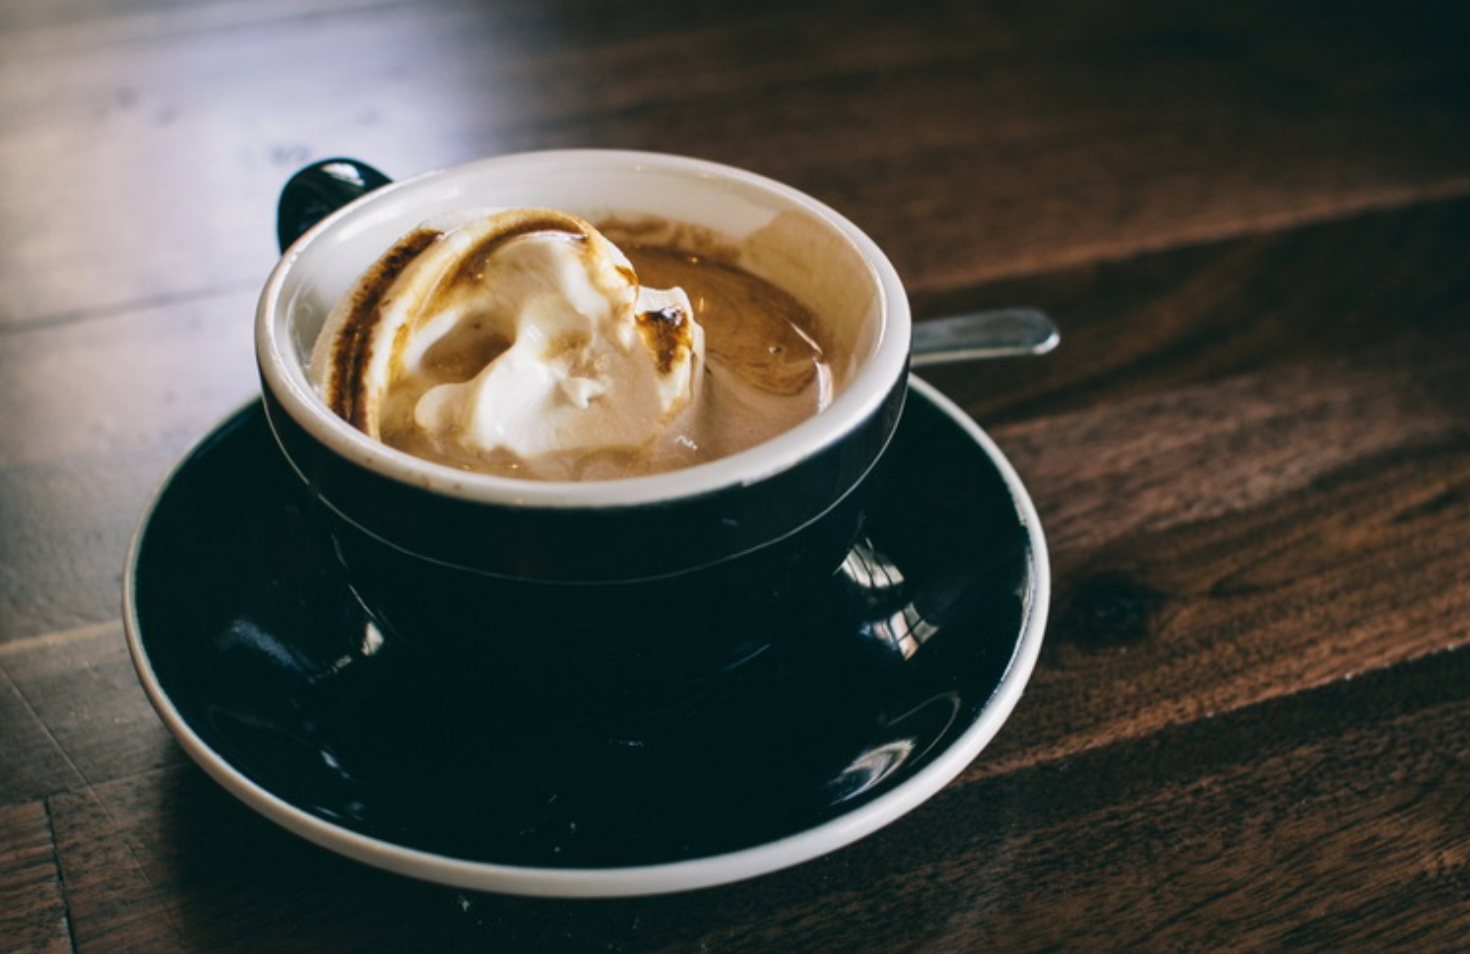 Brazilian coffee with cocoa and ice cream